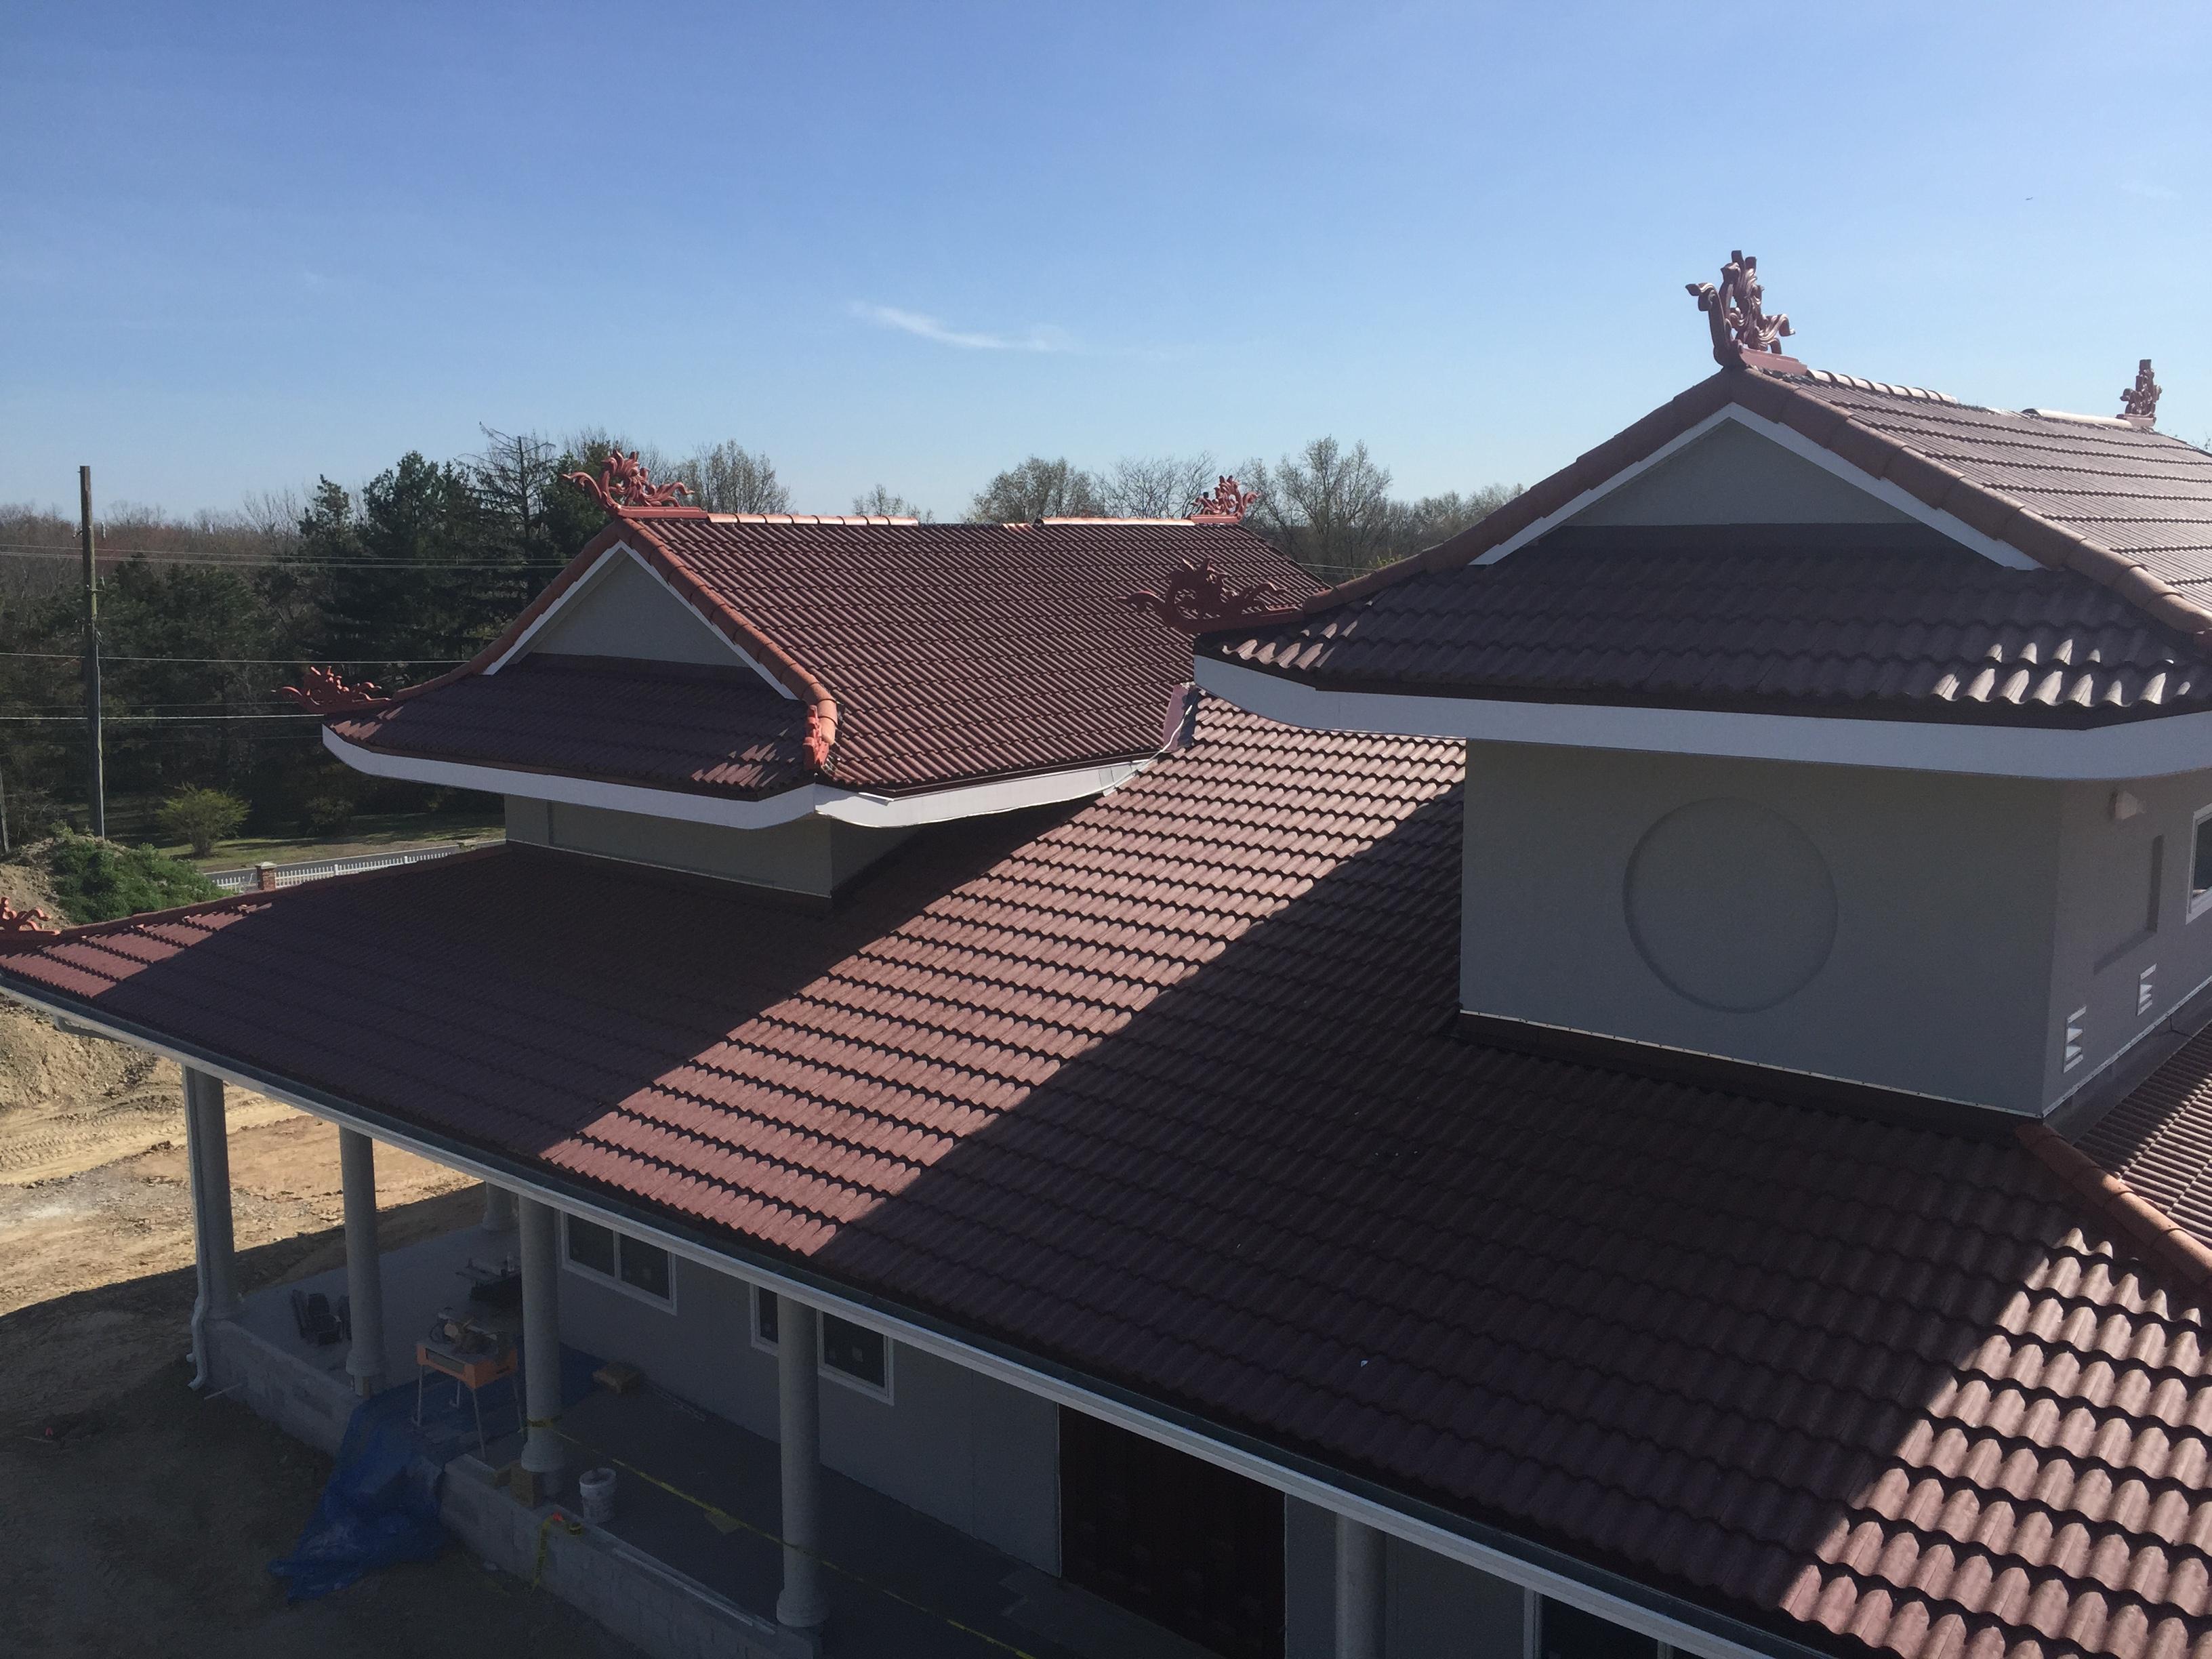 Jb Roofing Systems Llc Harleysville Pennsylvania Proview